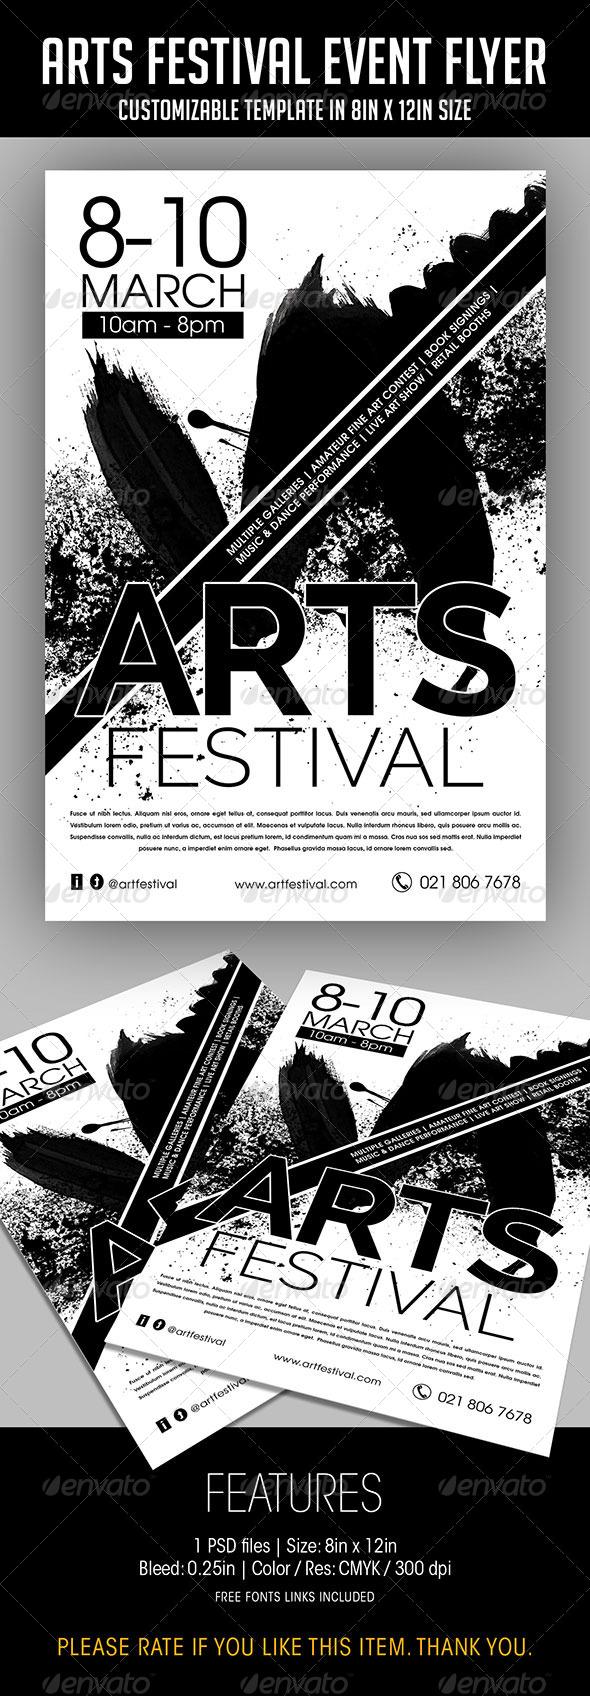 GraphicRiver Arts Festival Event Flyer 7590625